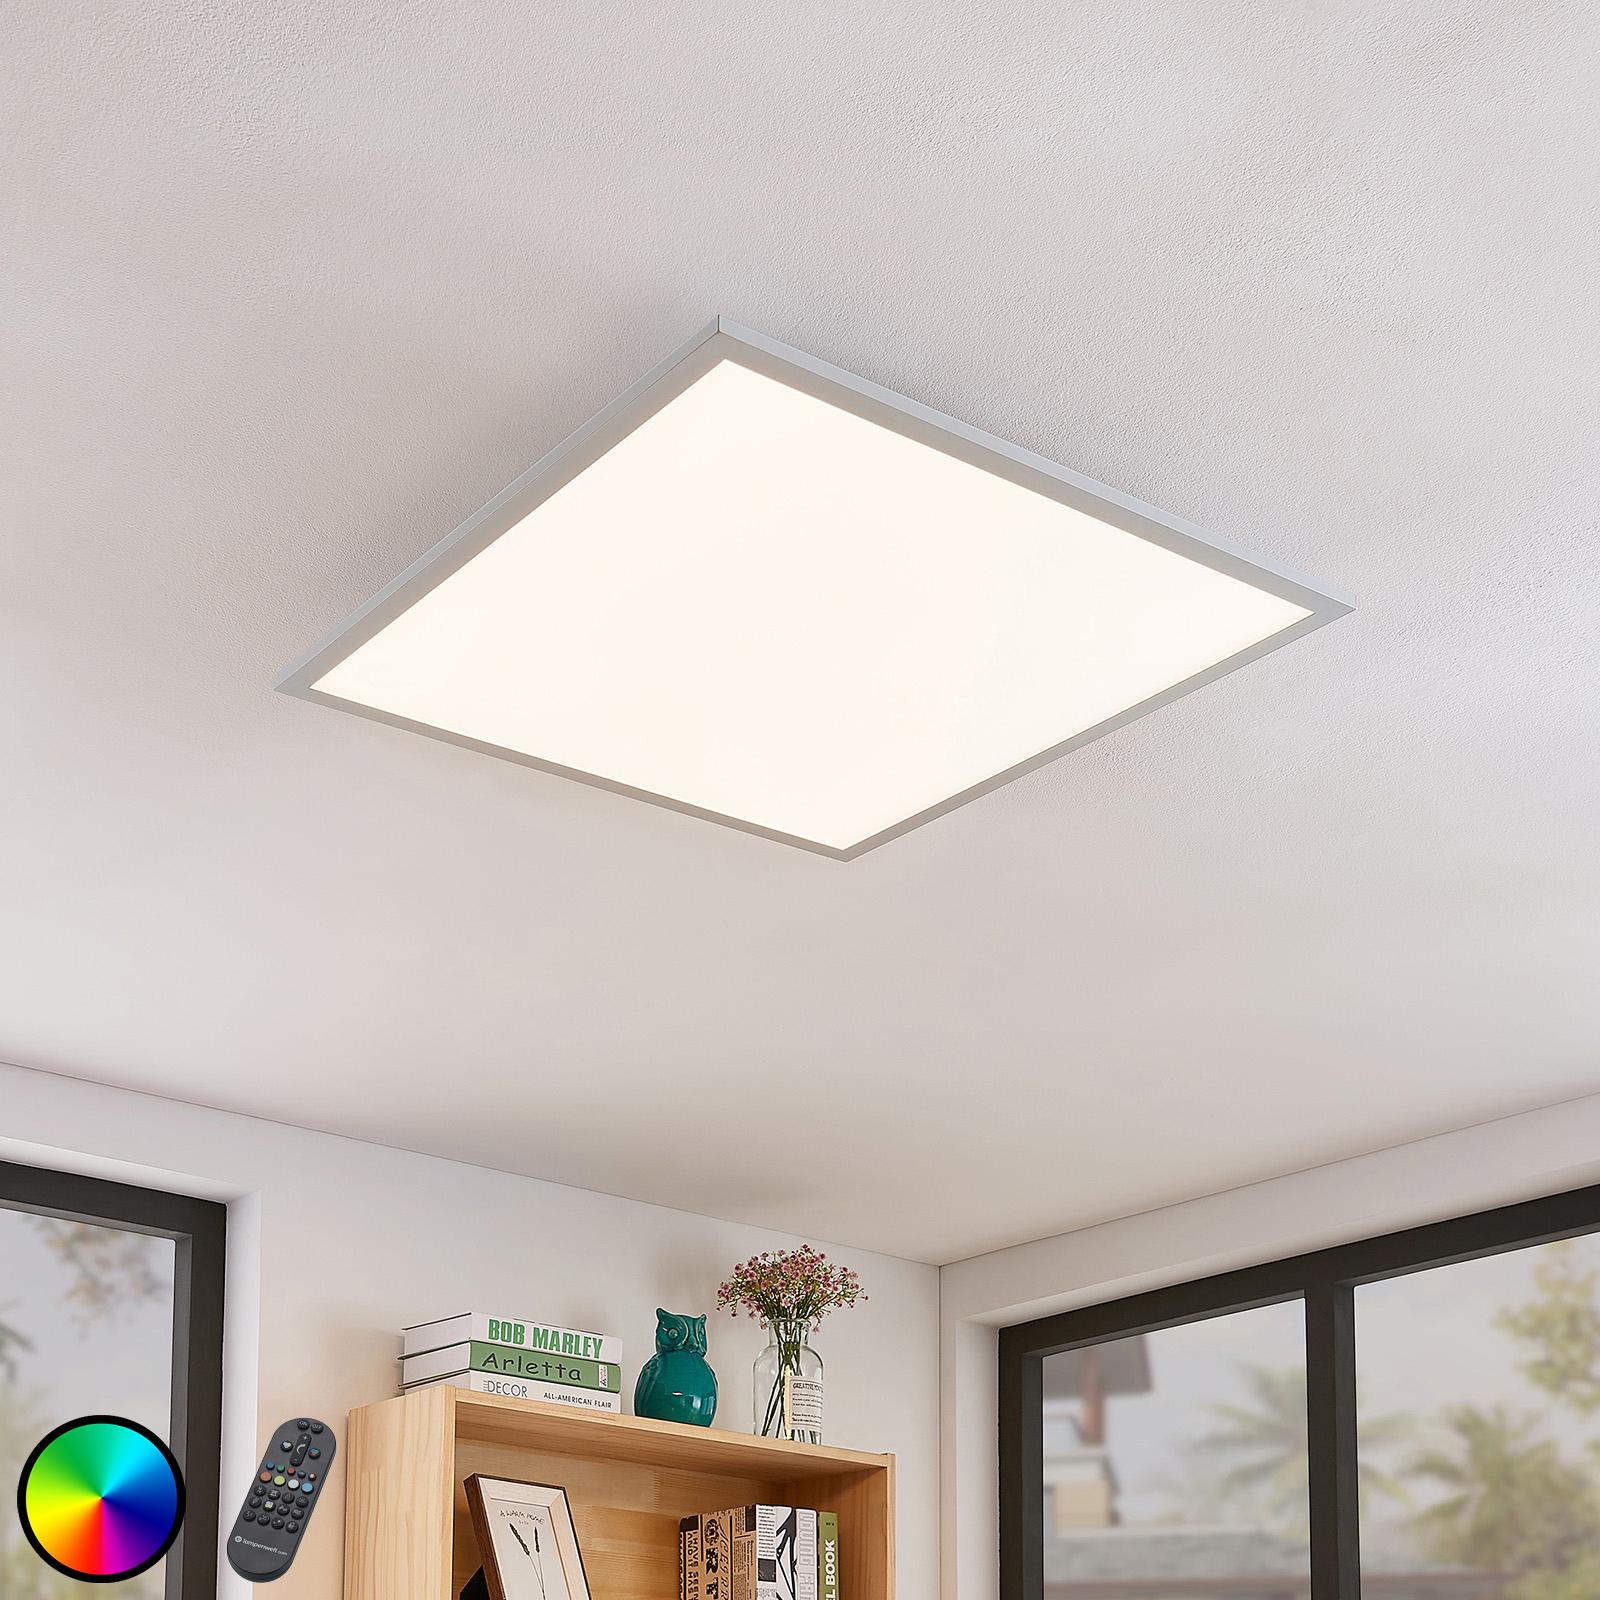 LED plafondlamp Milian m afstandsbediening 62x62cm